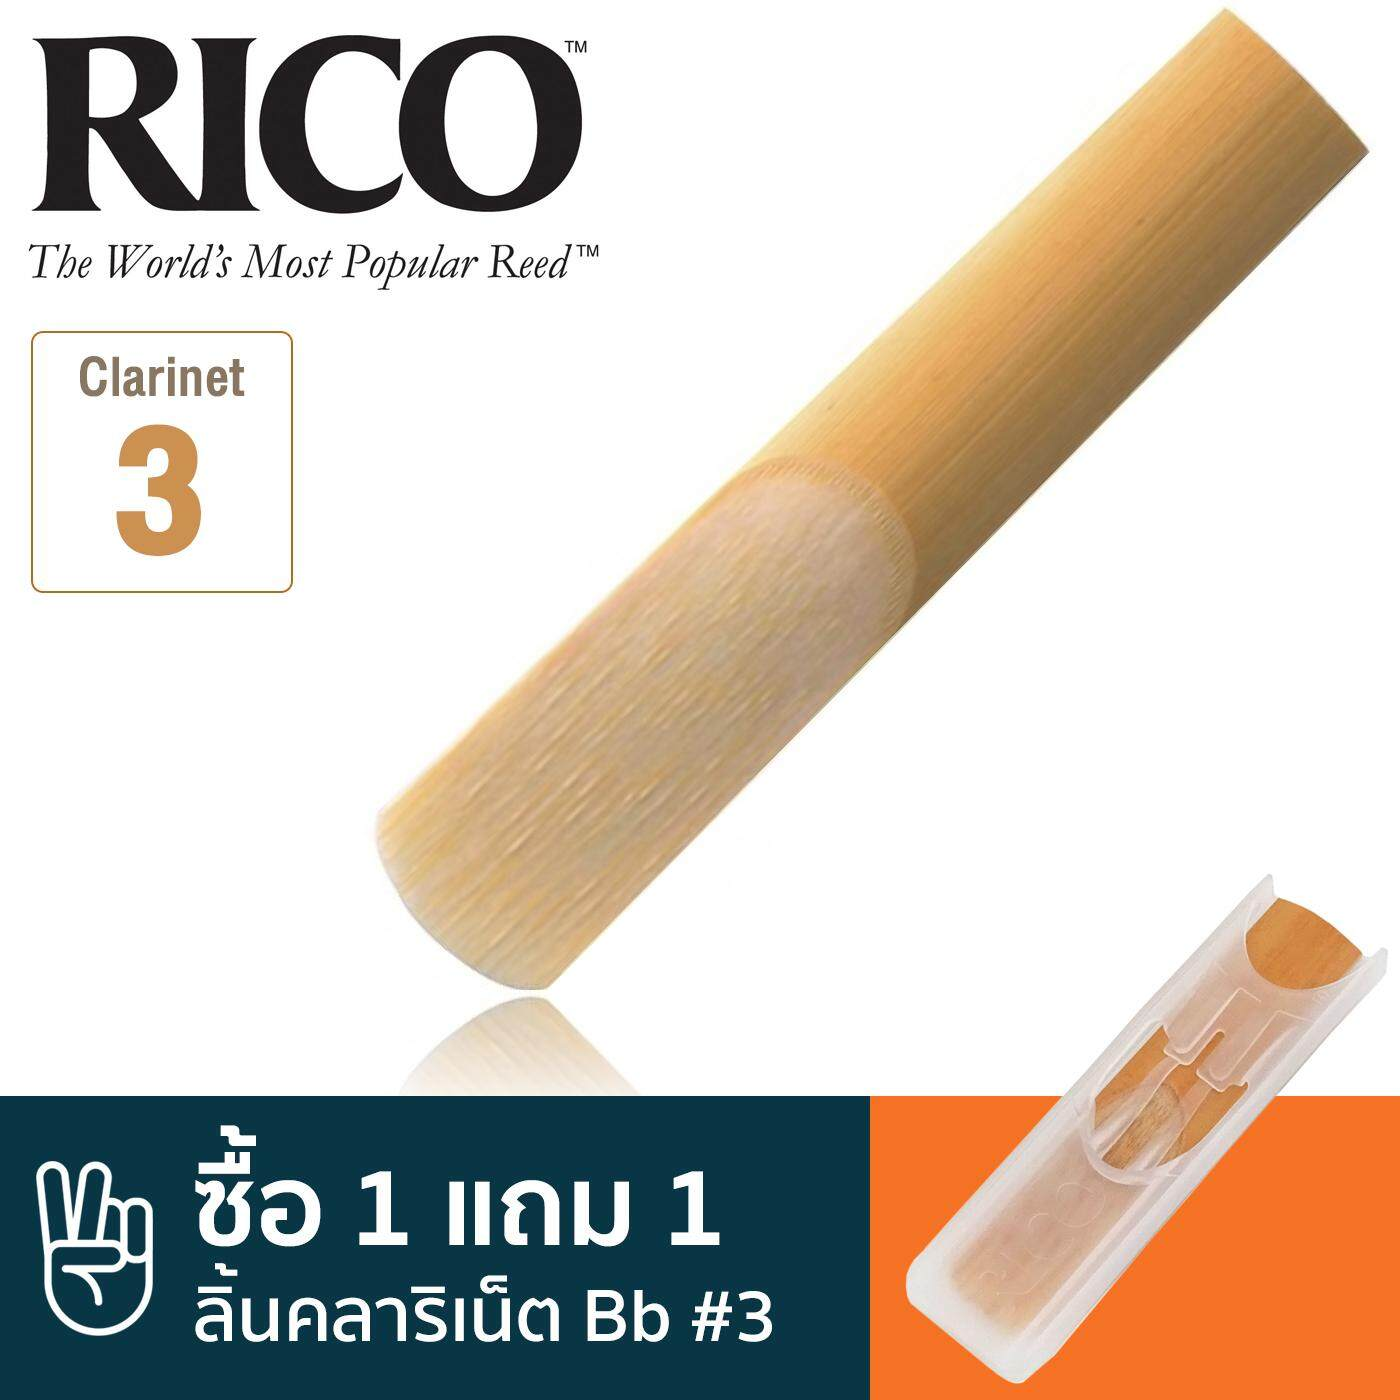 Rico™ ลิ้นคลาริเน็ต Bb เบอร์ 3 (ลิ้นปี่คลาริเน็ต เบอร์ 3, Bb Clarinet Reed) ** ซื้อ 1 แถม 1 ** By Rala Music.